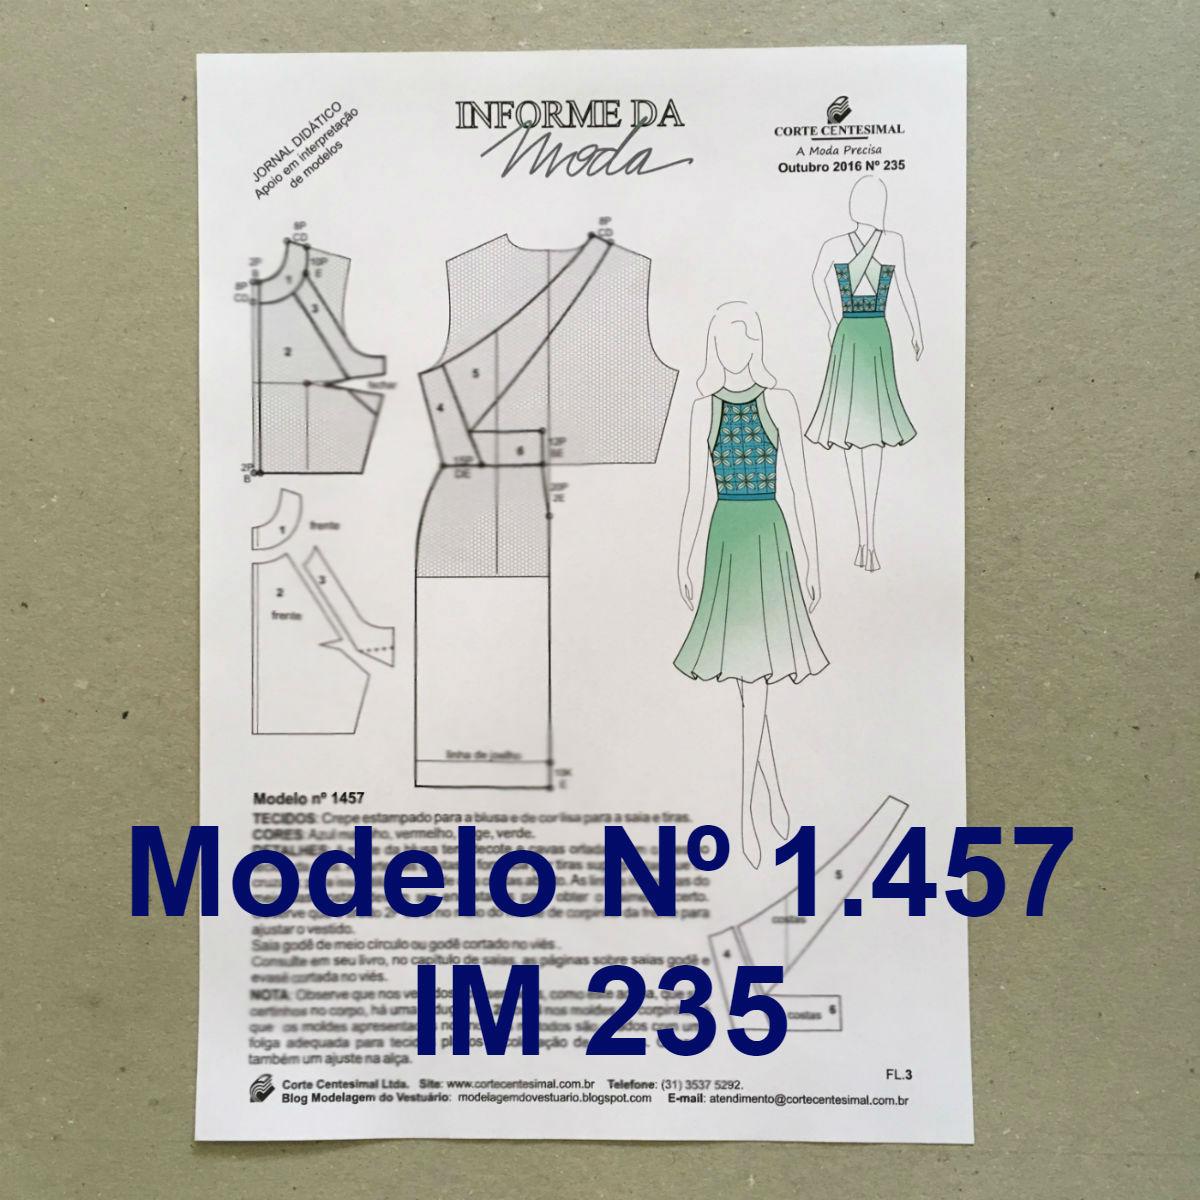 Informe da Moda 2016 (234 e 235)  - Corte Centesimal